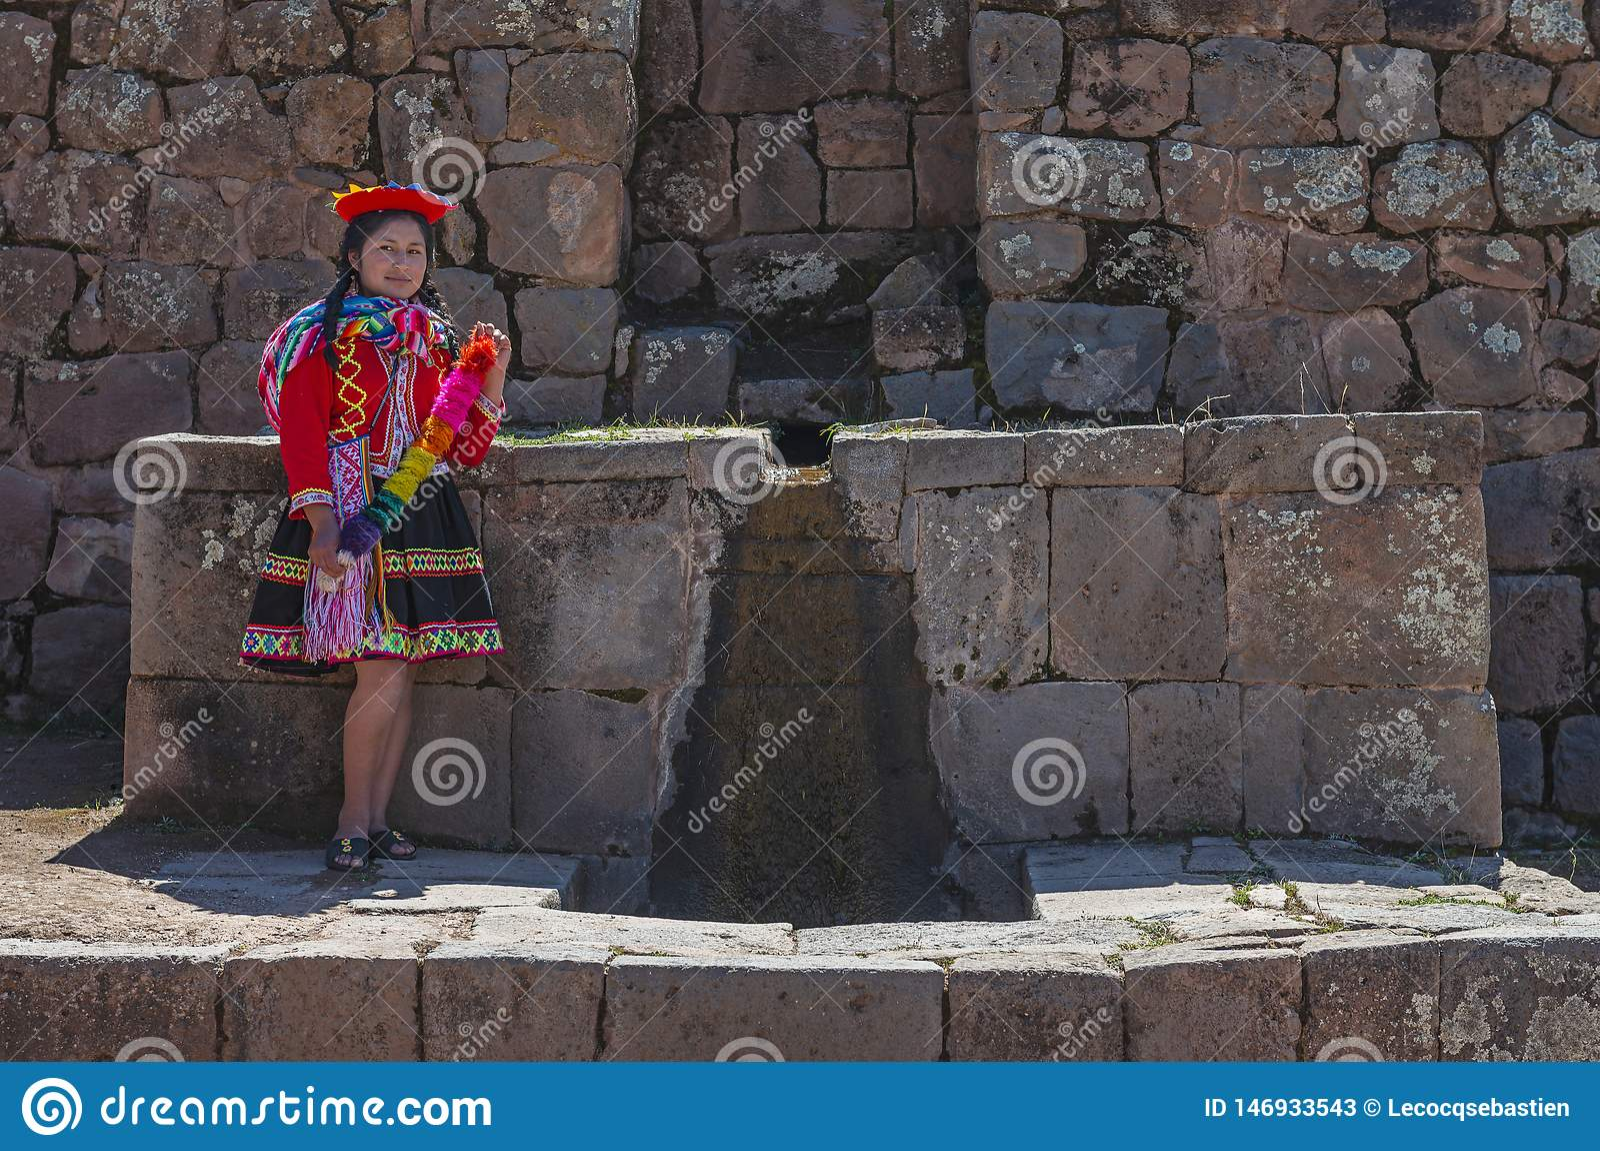 Peruvian Indigenous Woman by a Fountain, Cusco